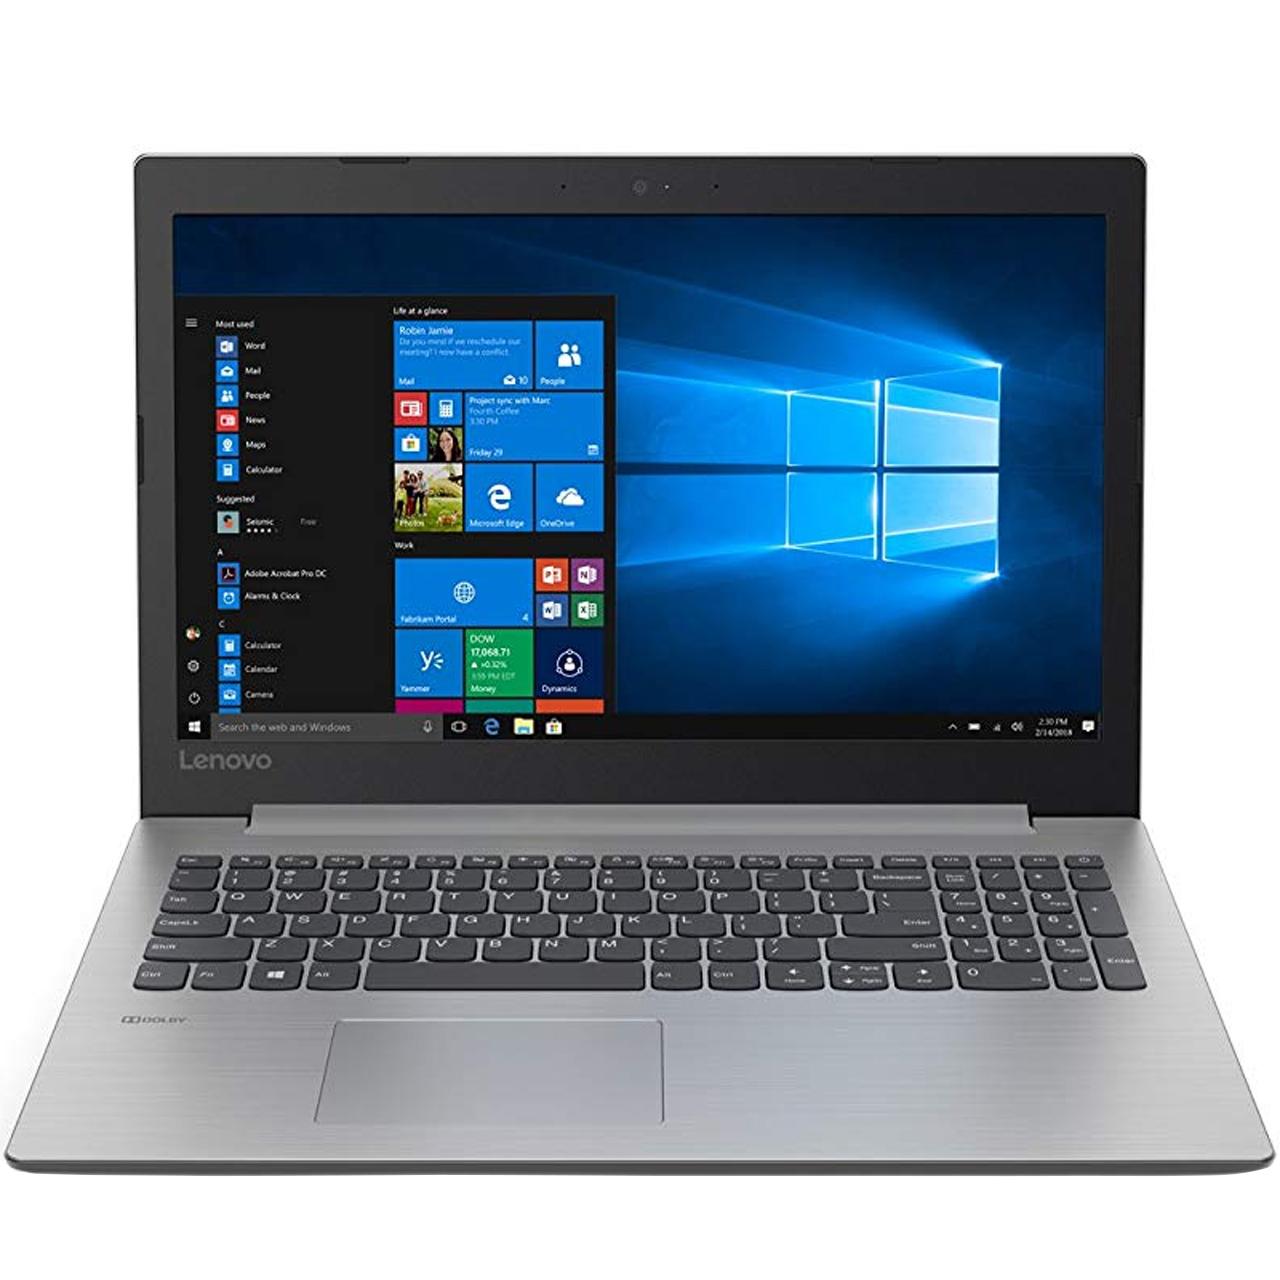 لپ تاپ 15 اینچی لنوو مدل Ideapad 330 - CQ